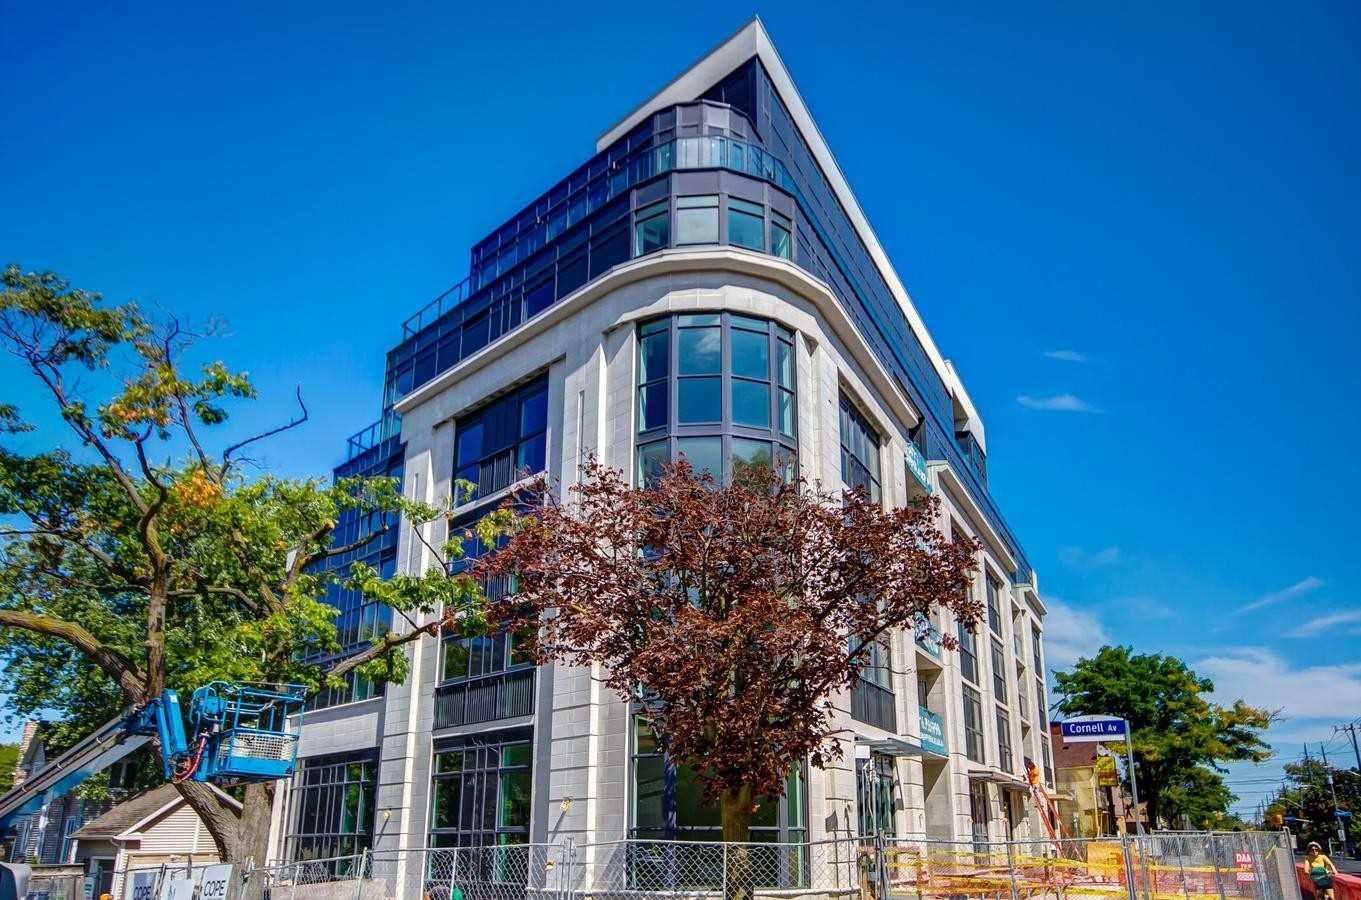 1400 Kingston Rd, Toronto, Ontario M1N1R3, 1 Bedroom Bedrooms, ,2 BathroomsBathrooms,Condo Apt,For Sale,Kingston,E5378017